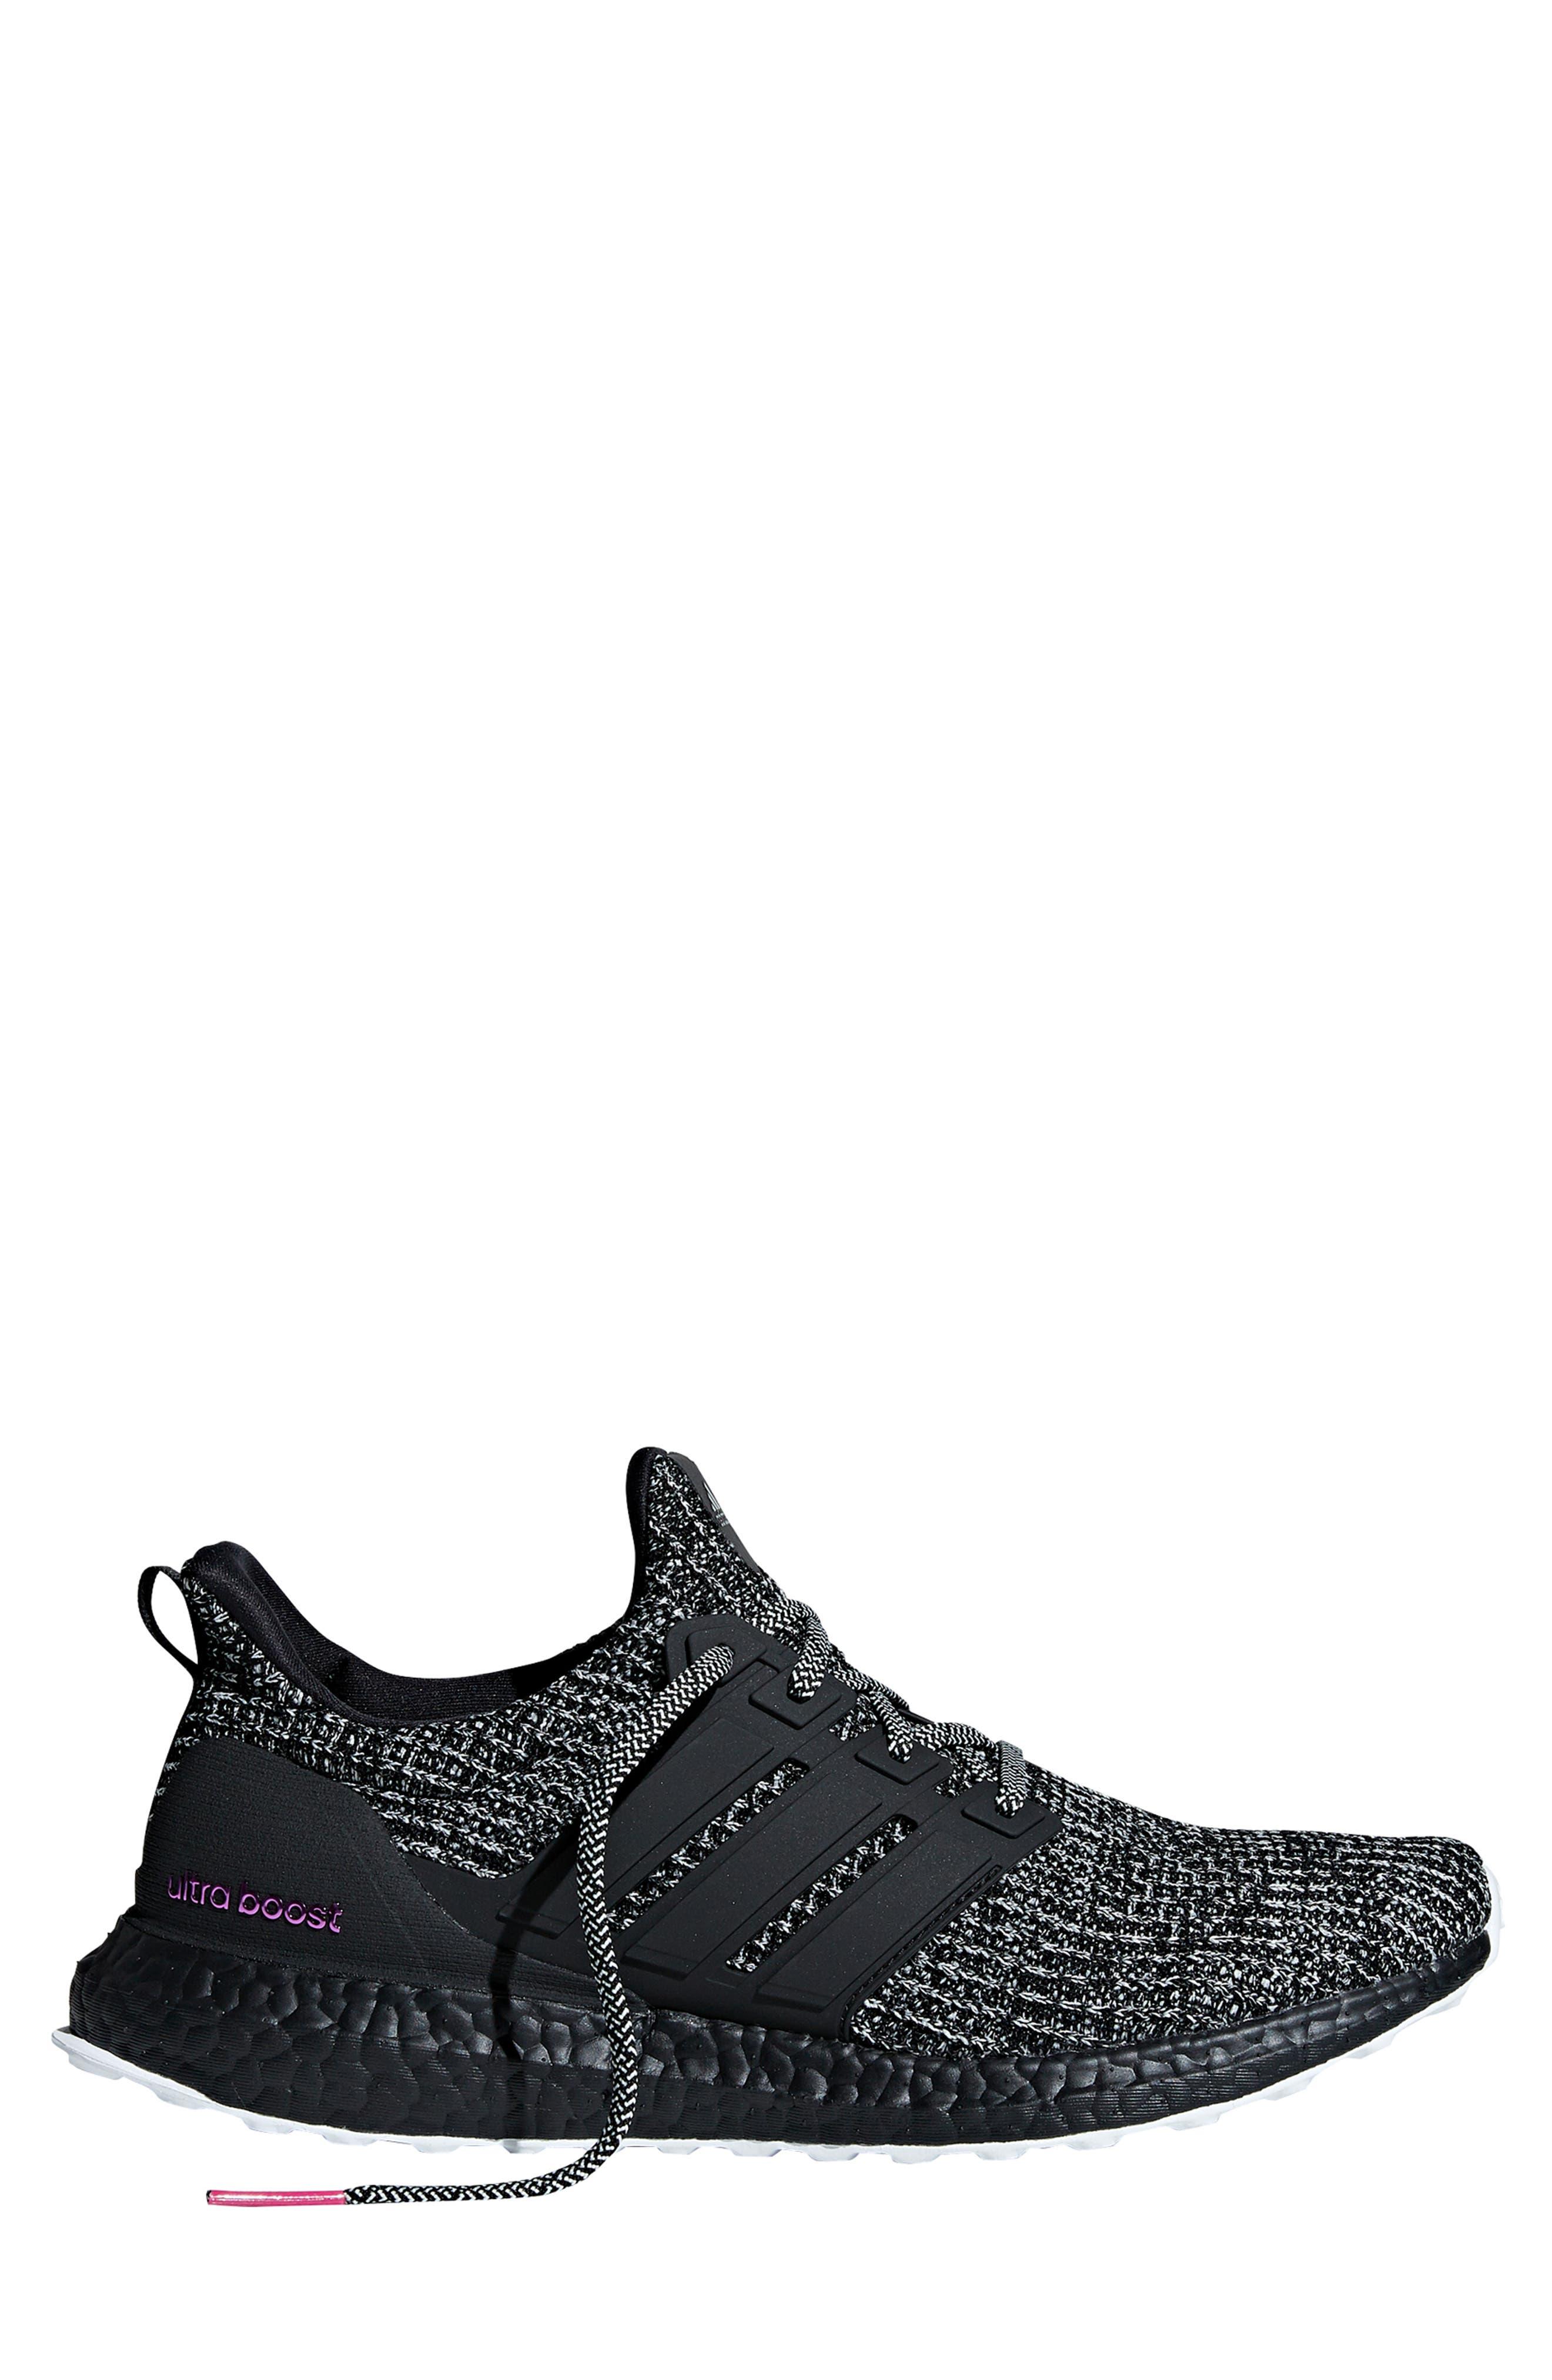 'UltraBoost' Running Shoe,                             Alternate thumbnail 3, color,                             CLOUD WHITE/ BLACK/ SHOCK PINK